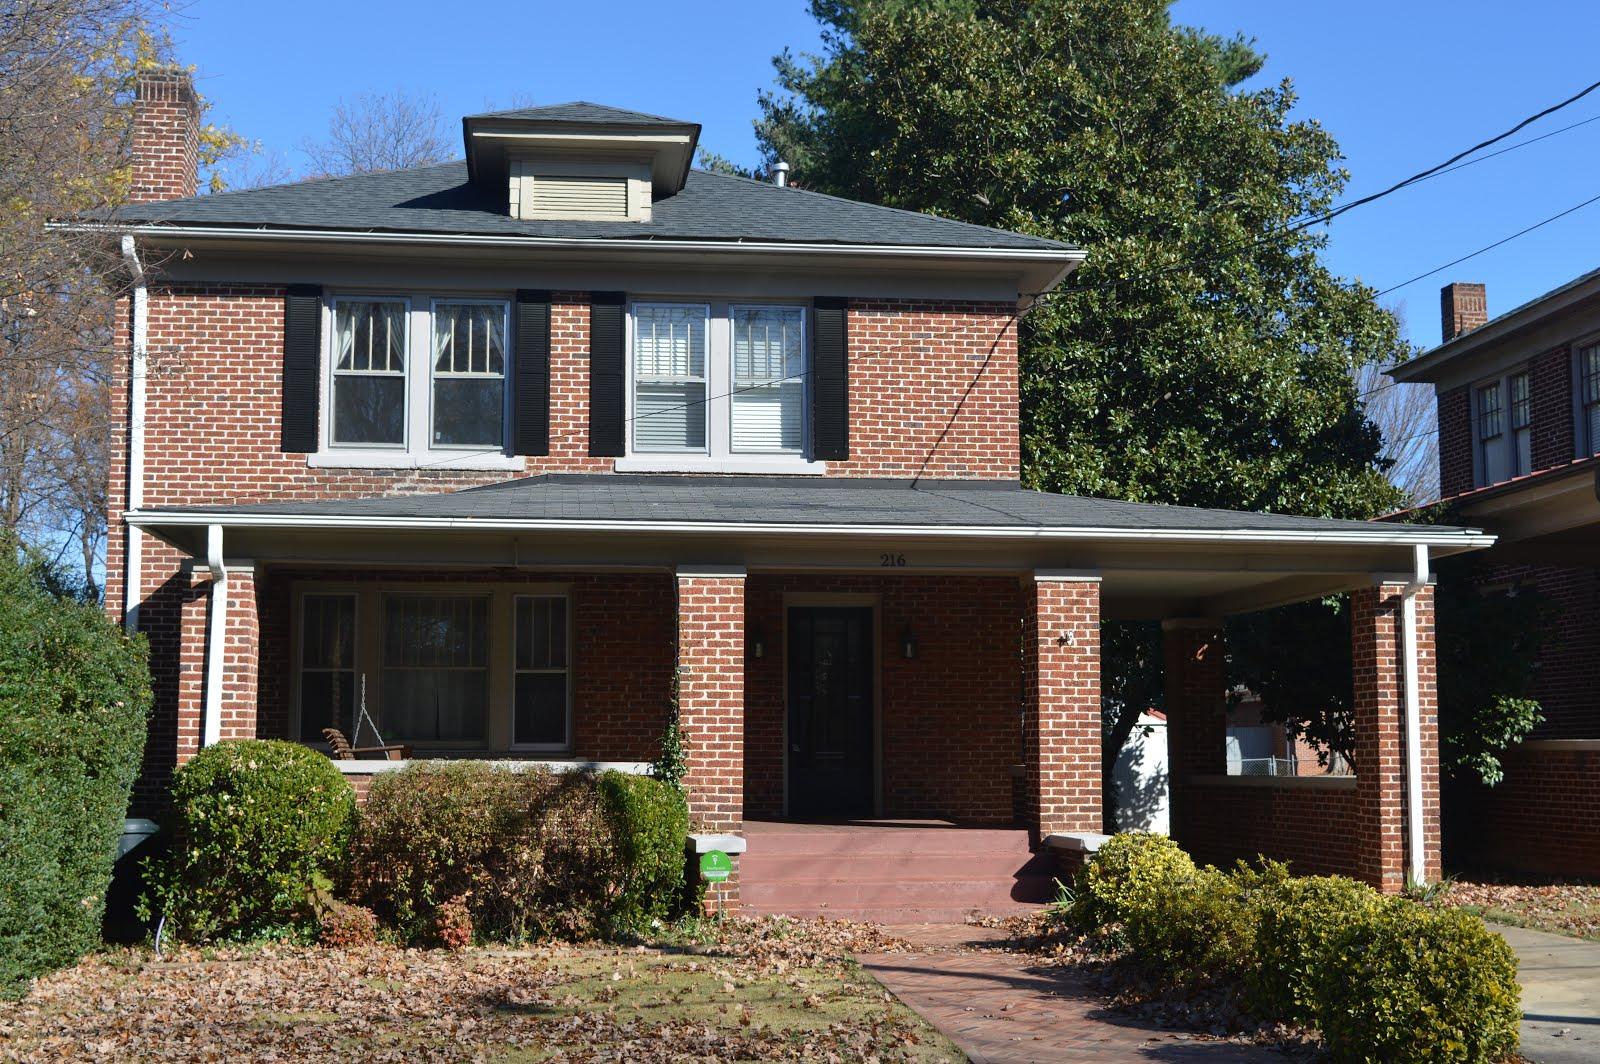 216 Mitchell Avenue, Salisbury NC 28144 ~ circa 1921 ~ $157,000